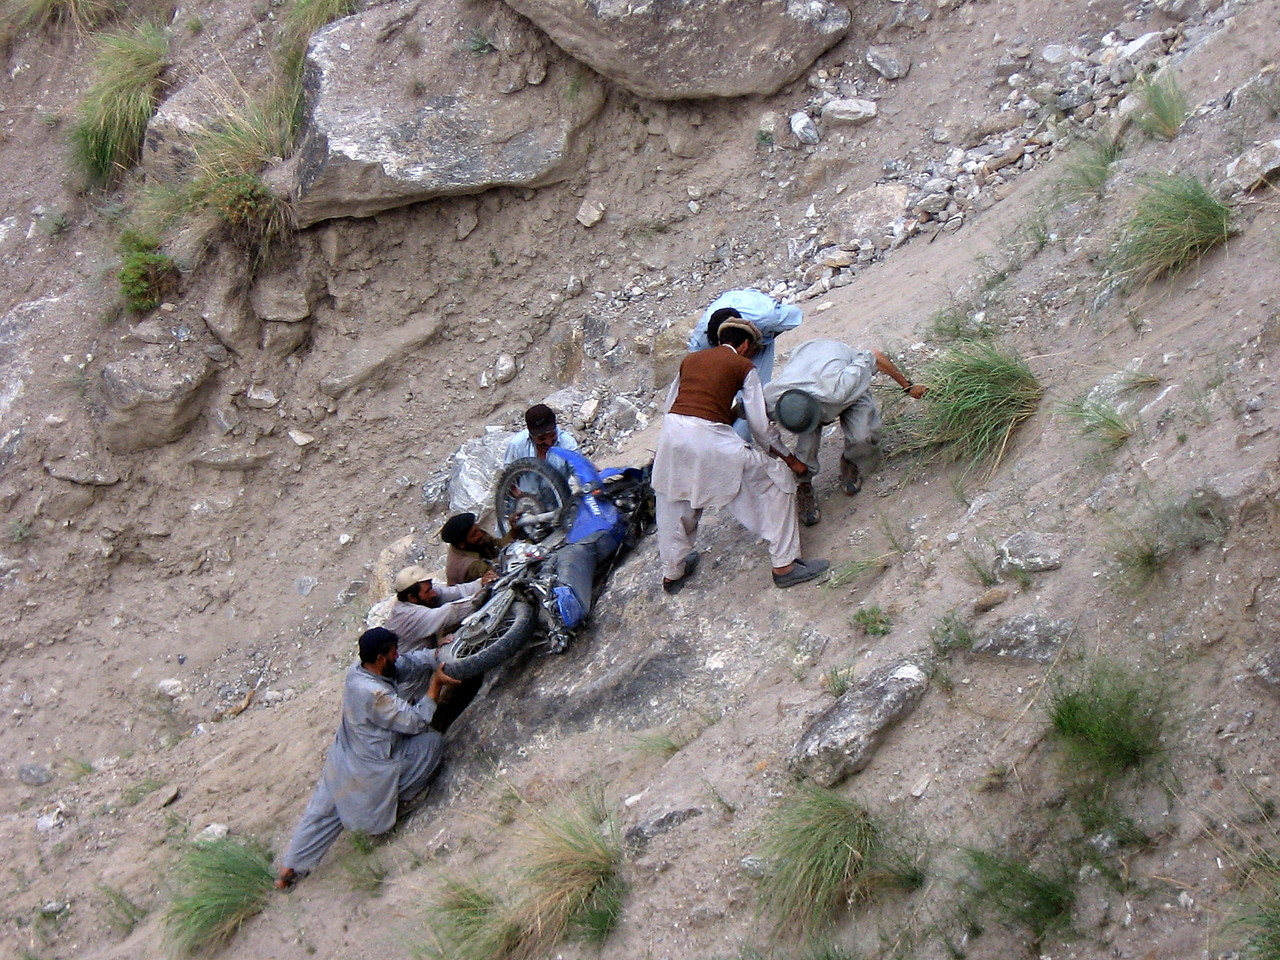 Recovering Pauls bike.  Road to Nanga Parbat